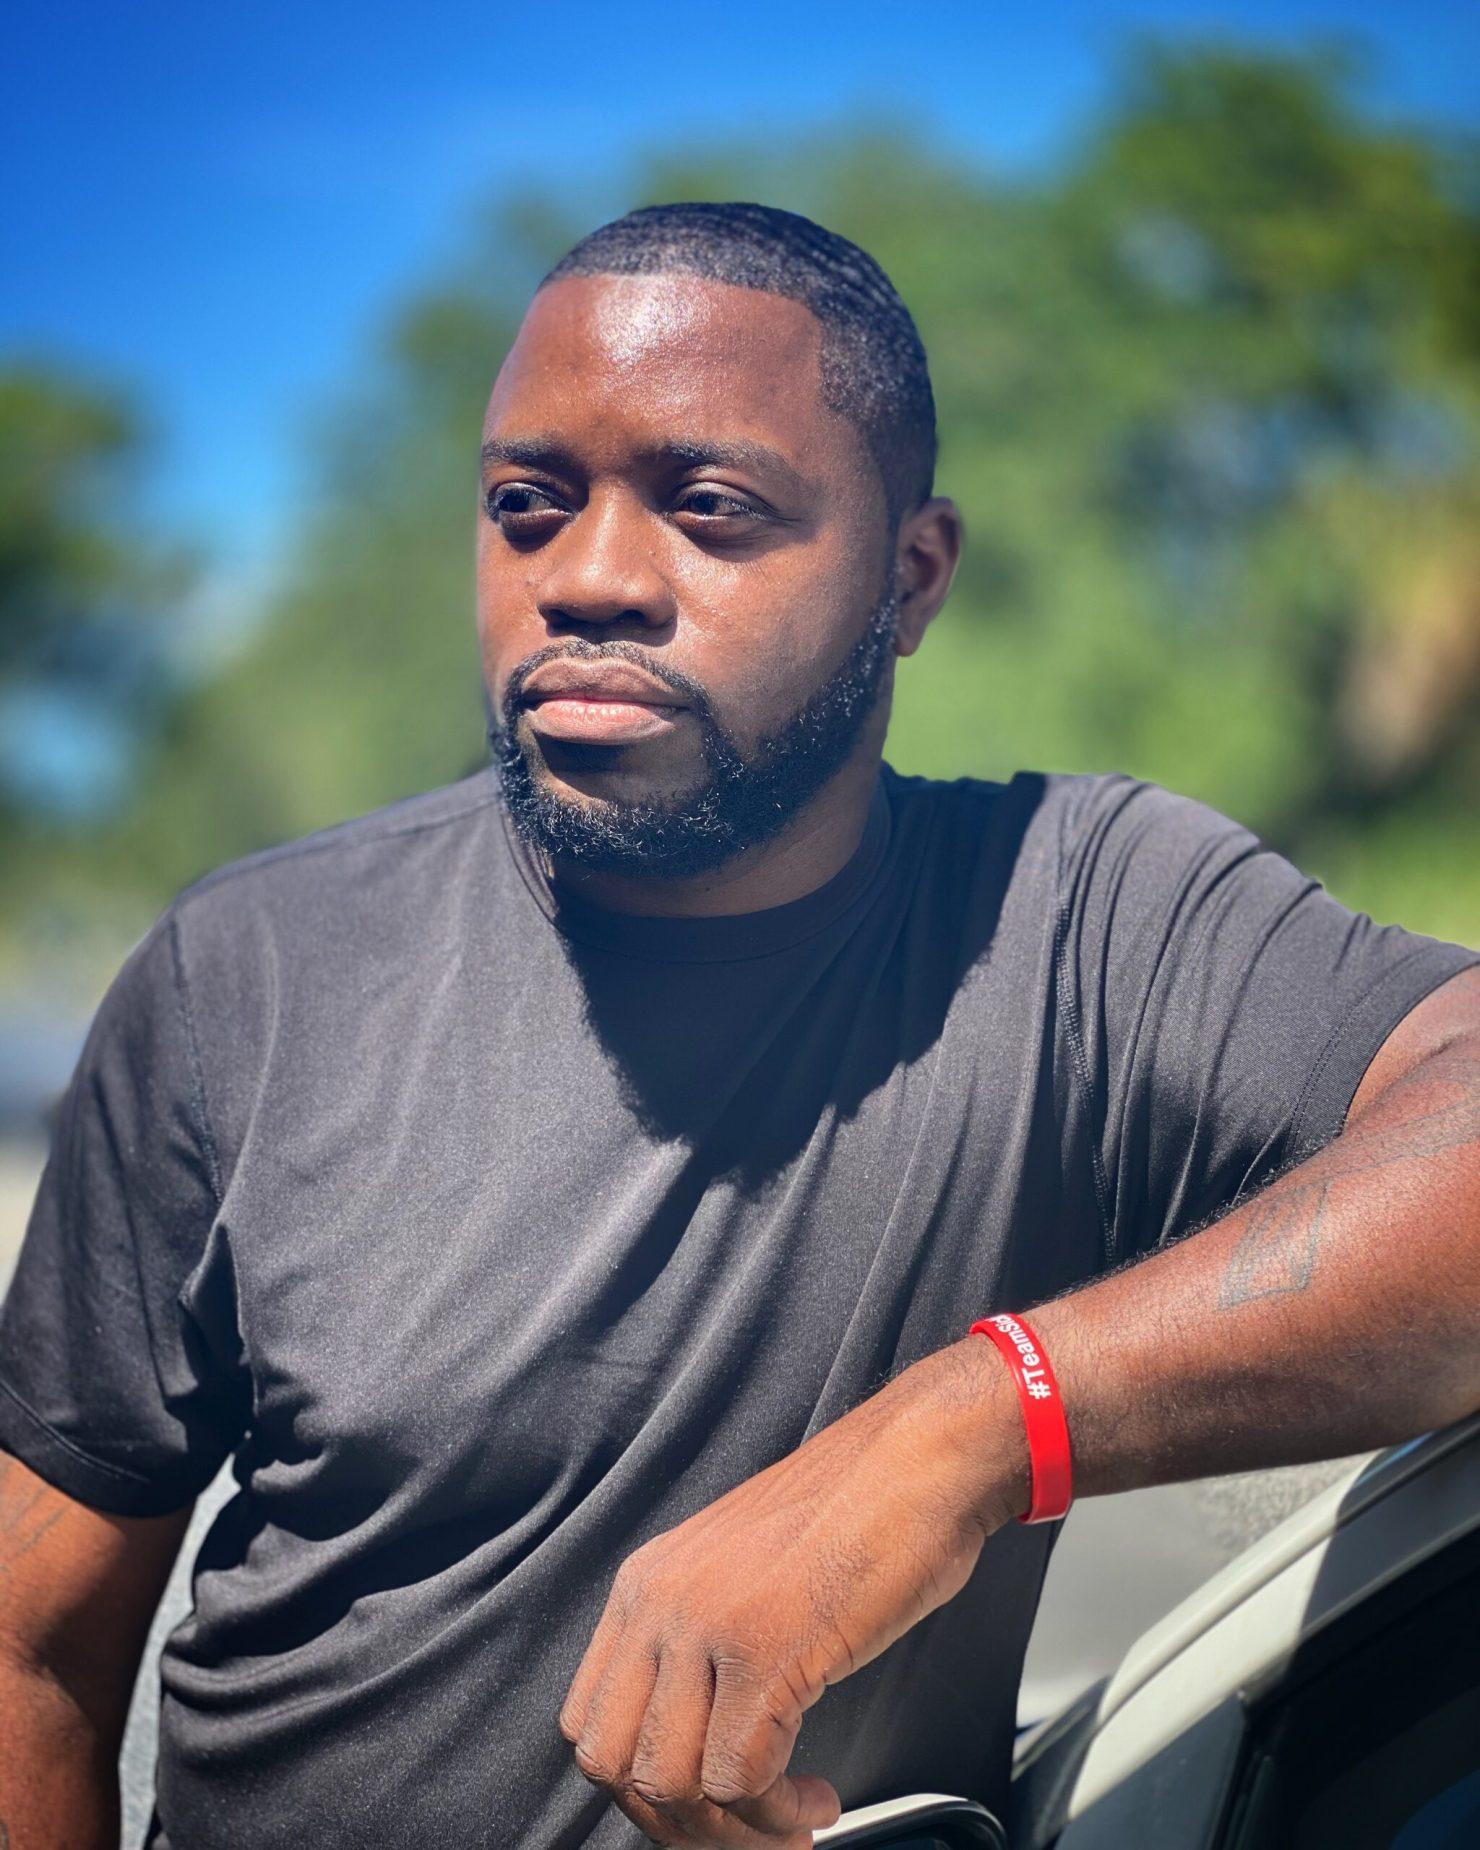 Hip-hop artist Fa'shotime Releases New Single Titled Get ya money